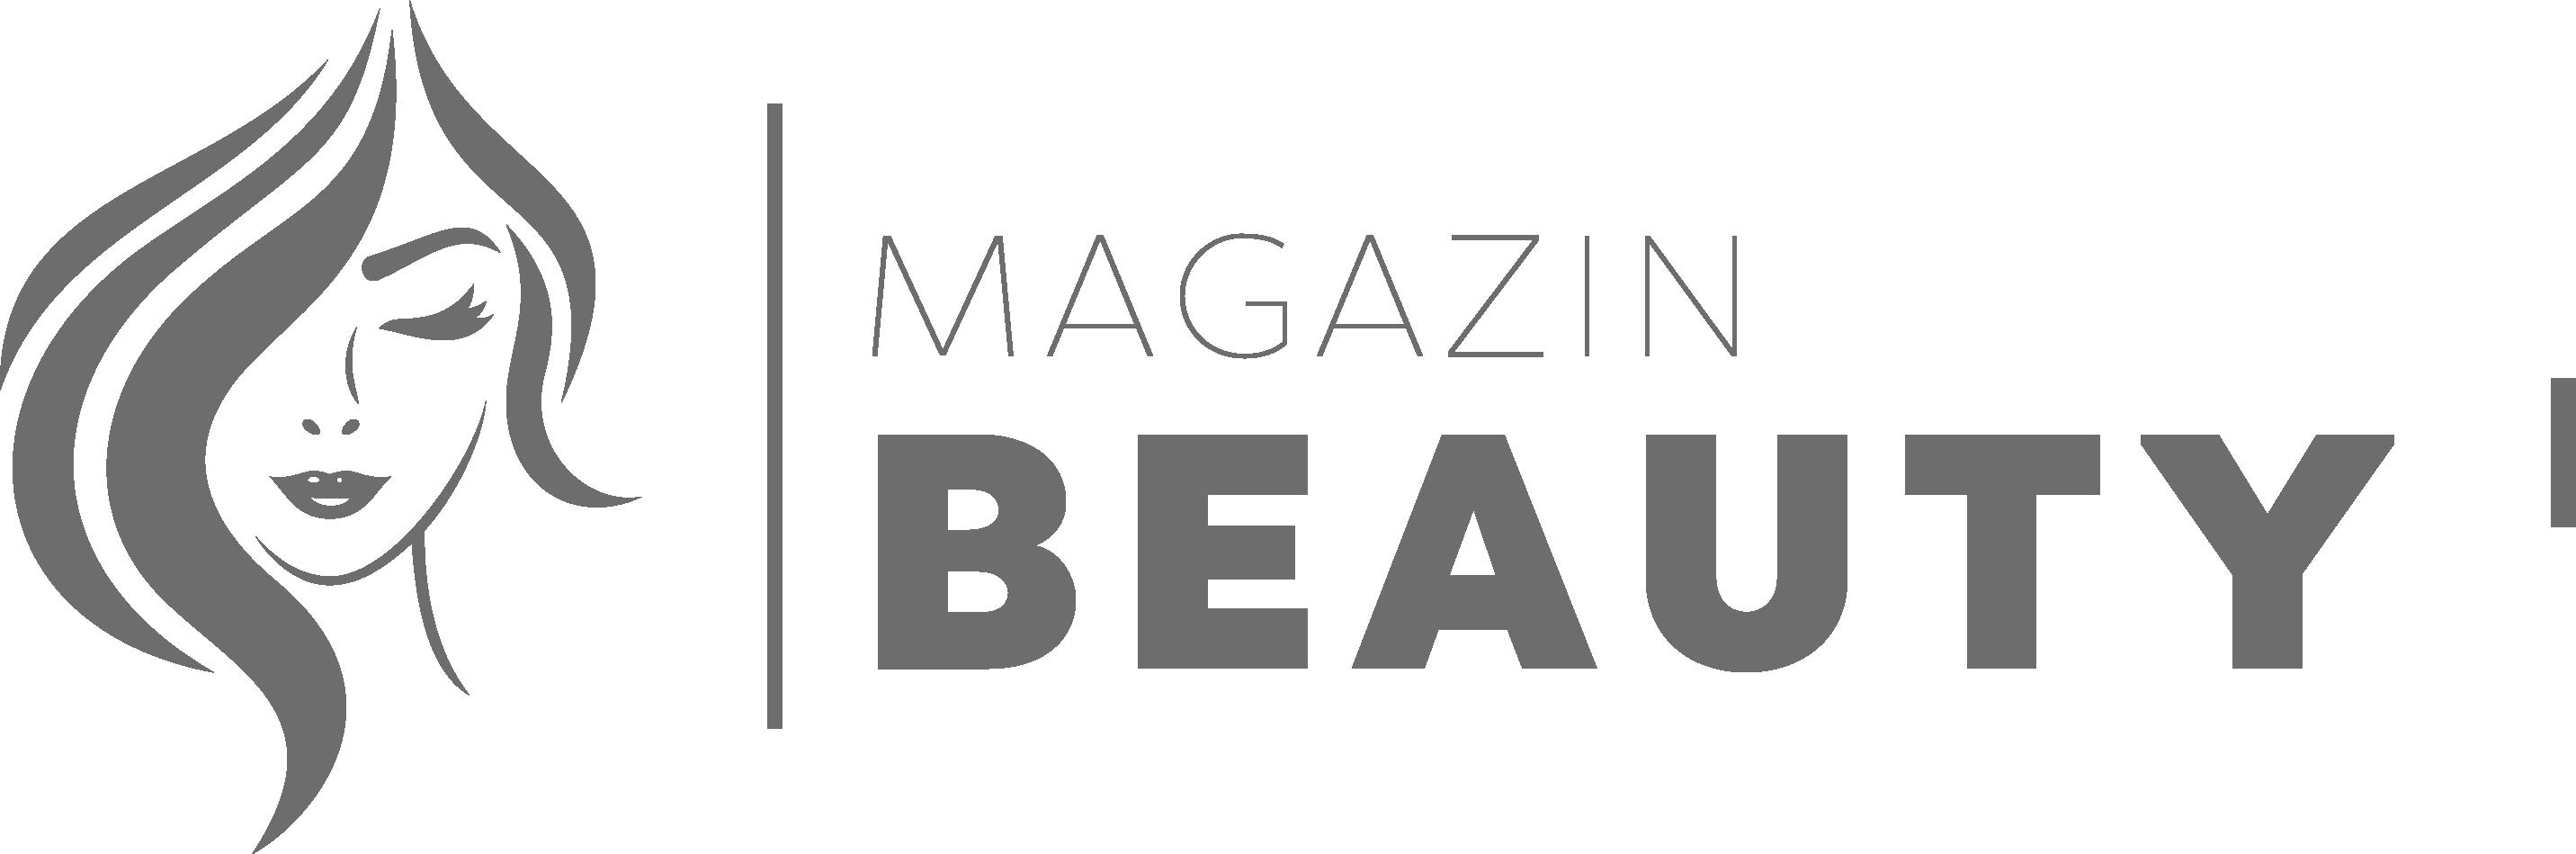 MagazinBeauty.de